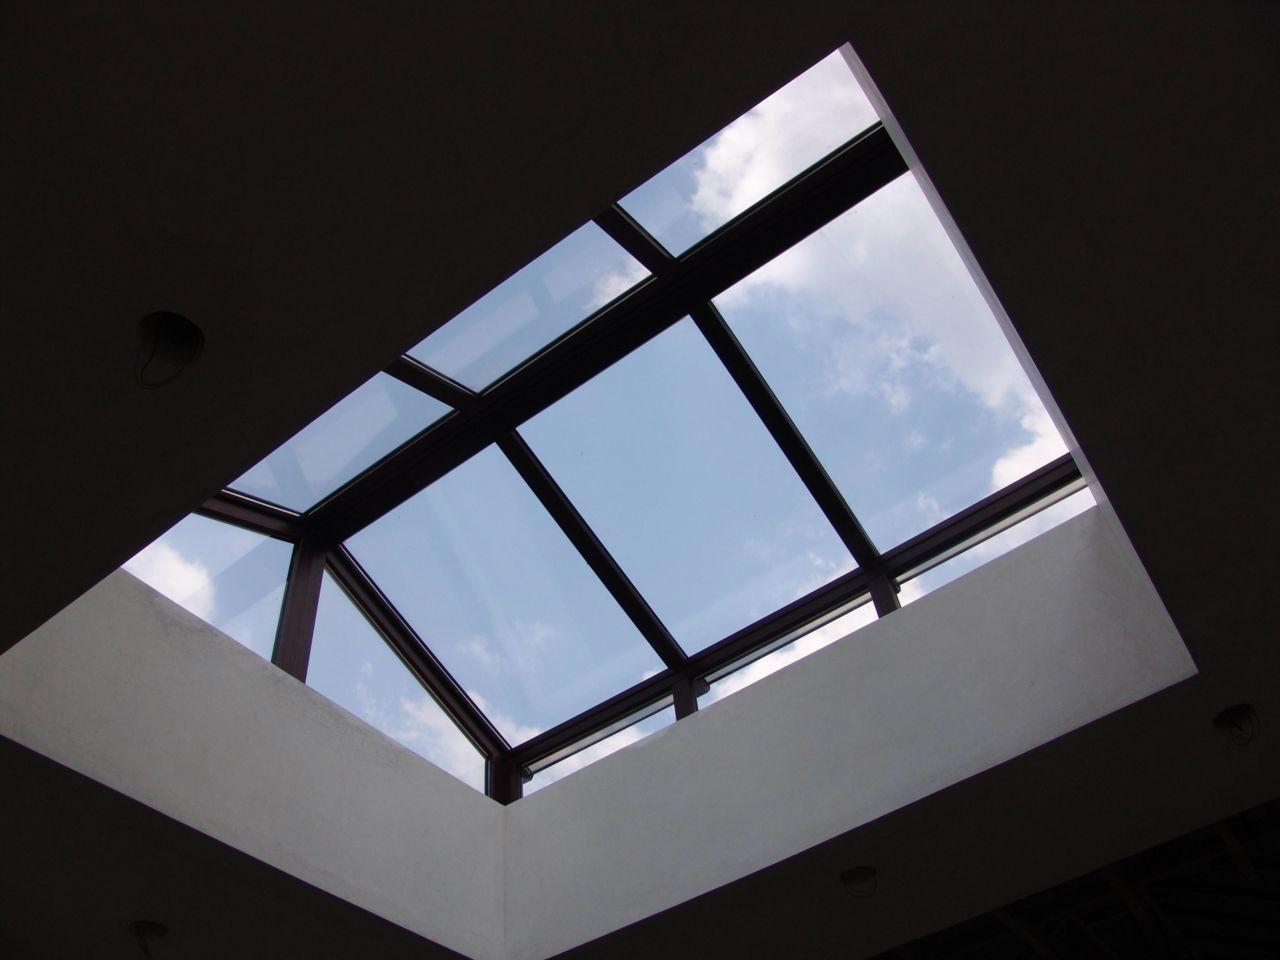 Iluminacion natural en tu casa con los tragaluces o for Tirol en techos de casas